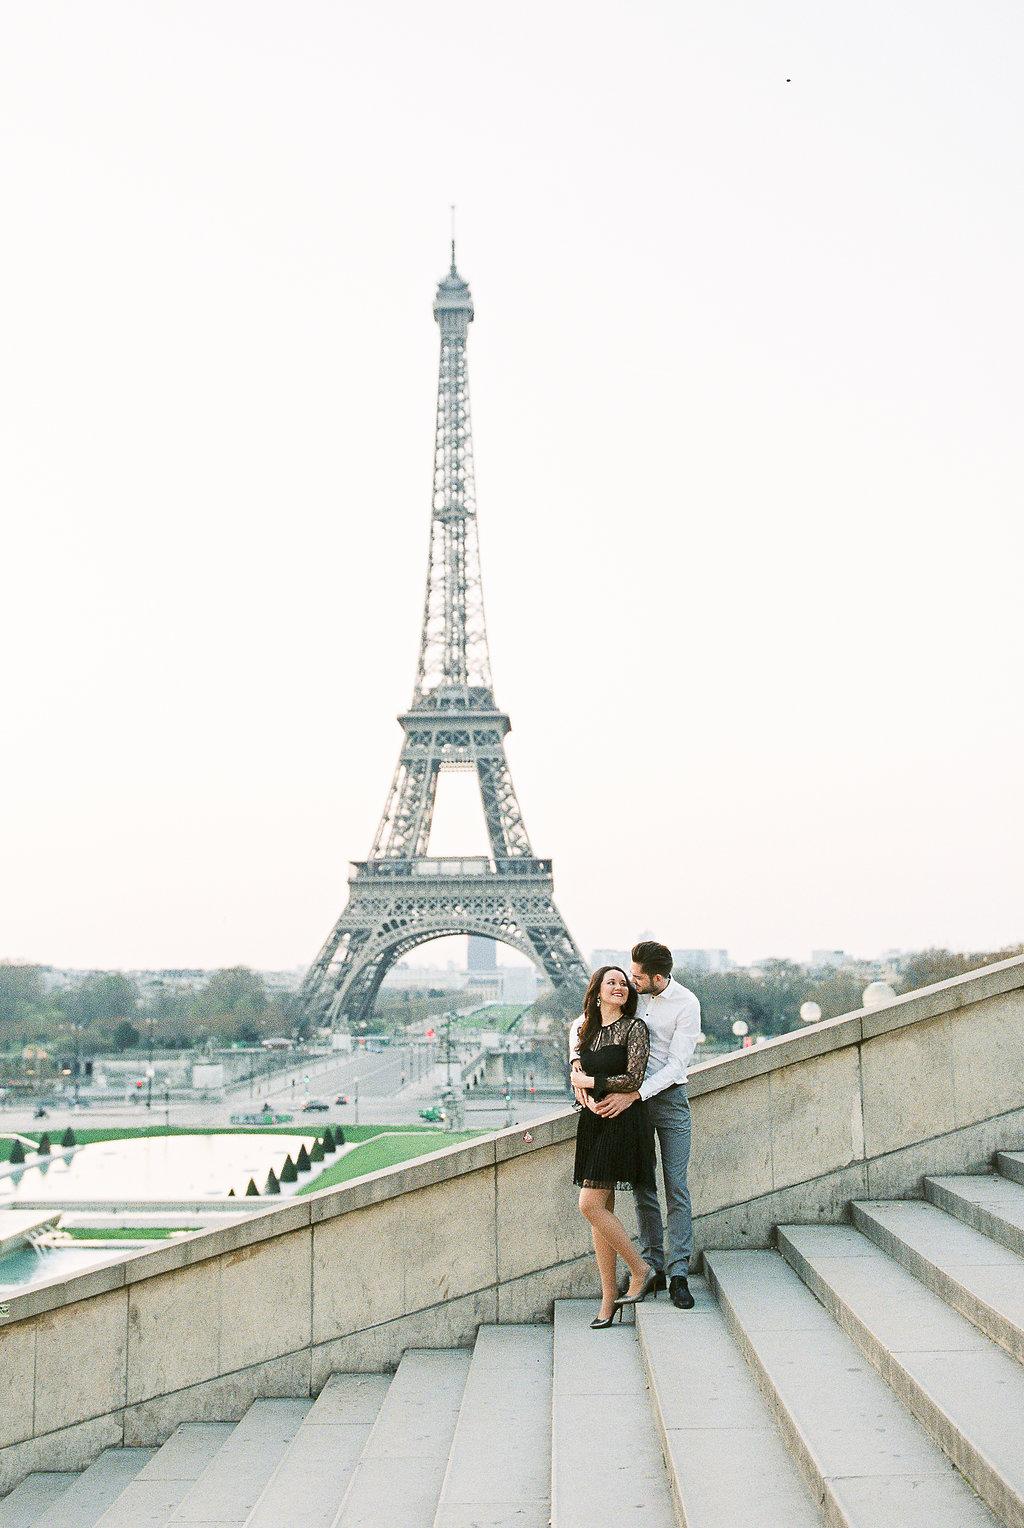 Germany fine art film wedding photographer | Kibogo Photography | Paris engagement session2.JPG